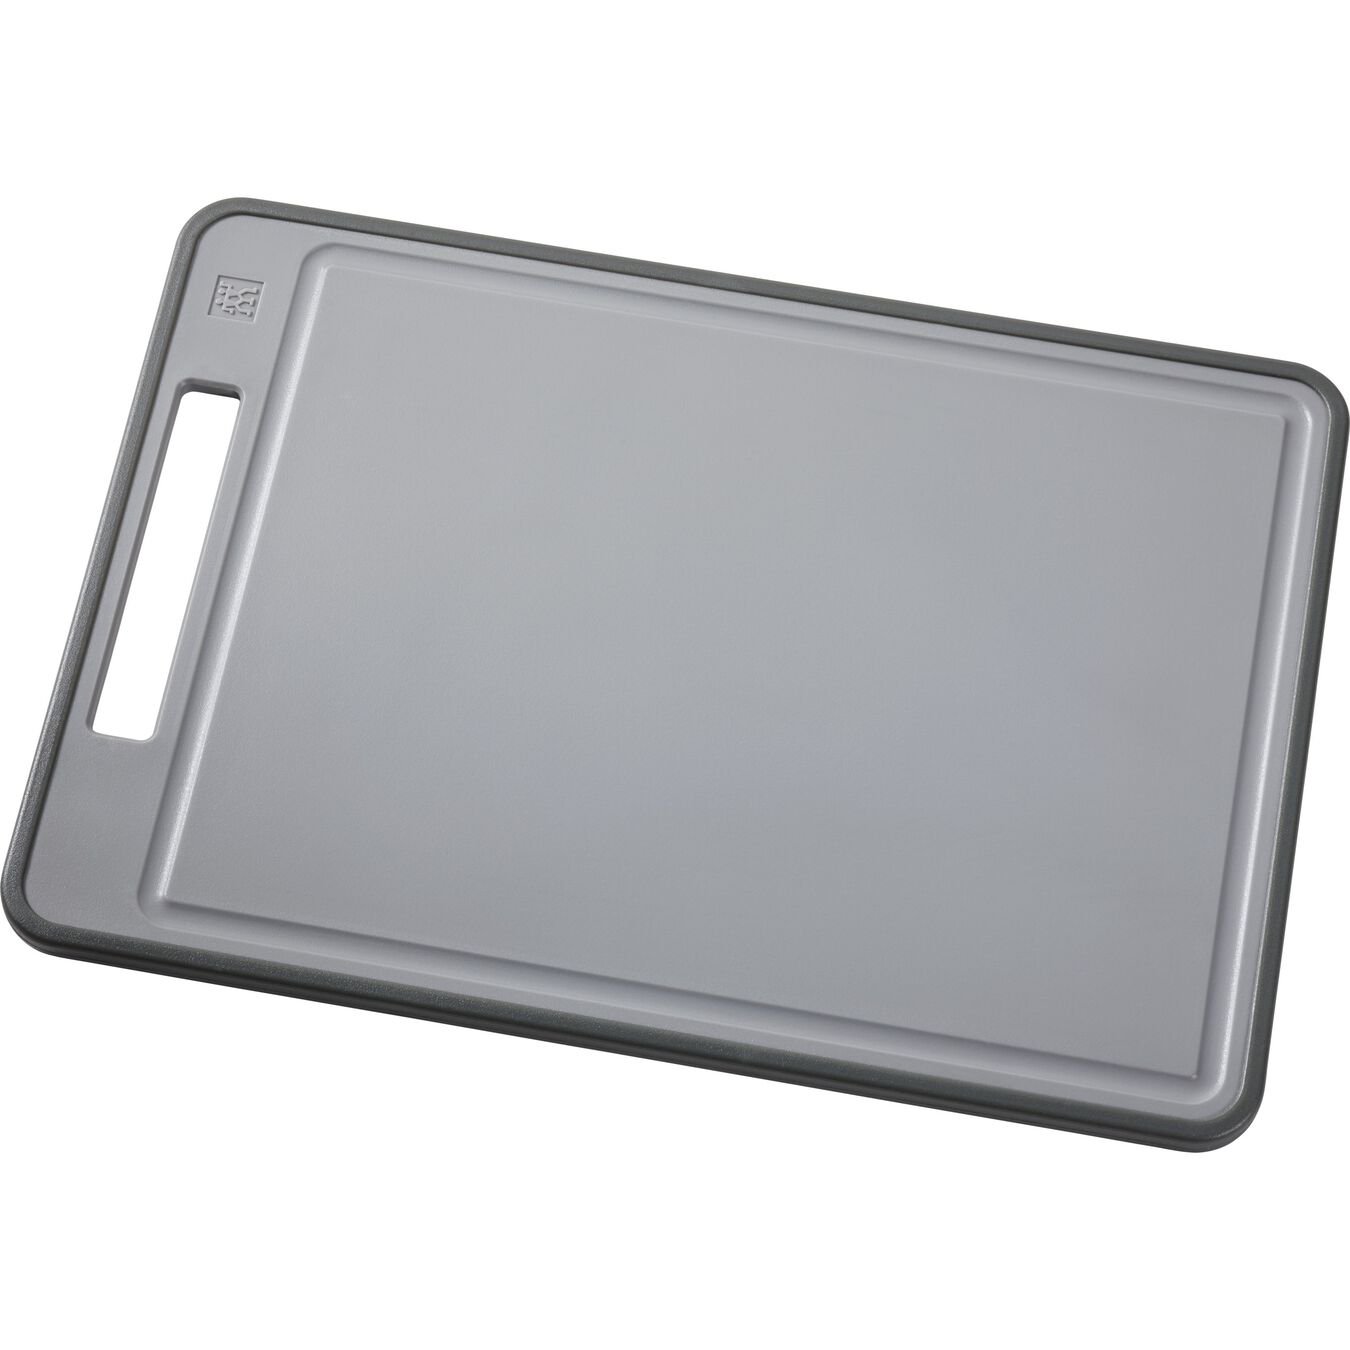 Tagliere - 43 cm x 30 cm, grigio,,large 1